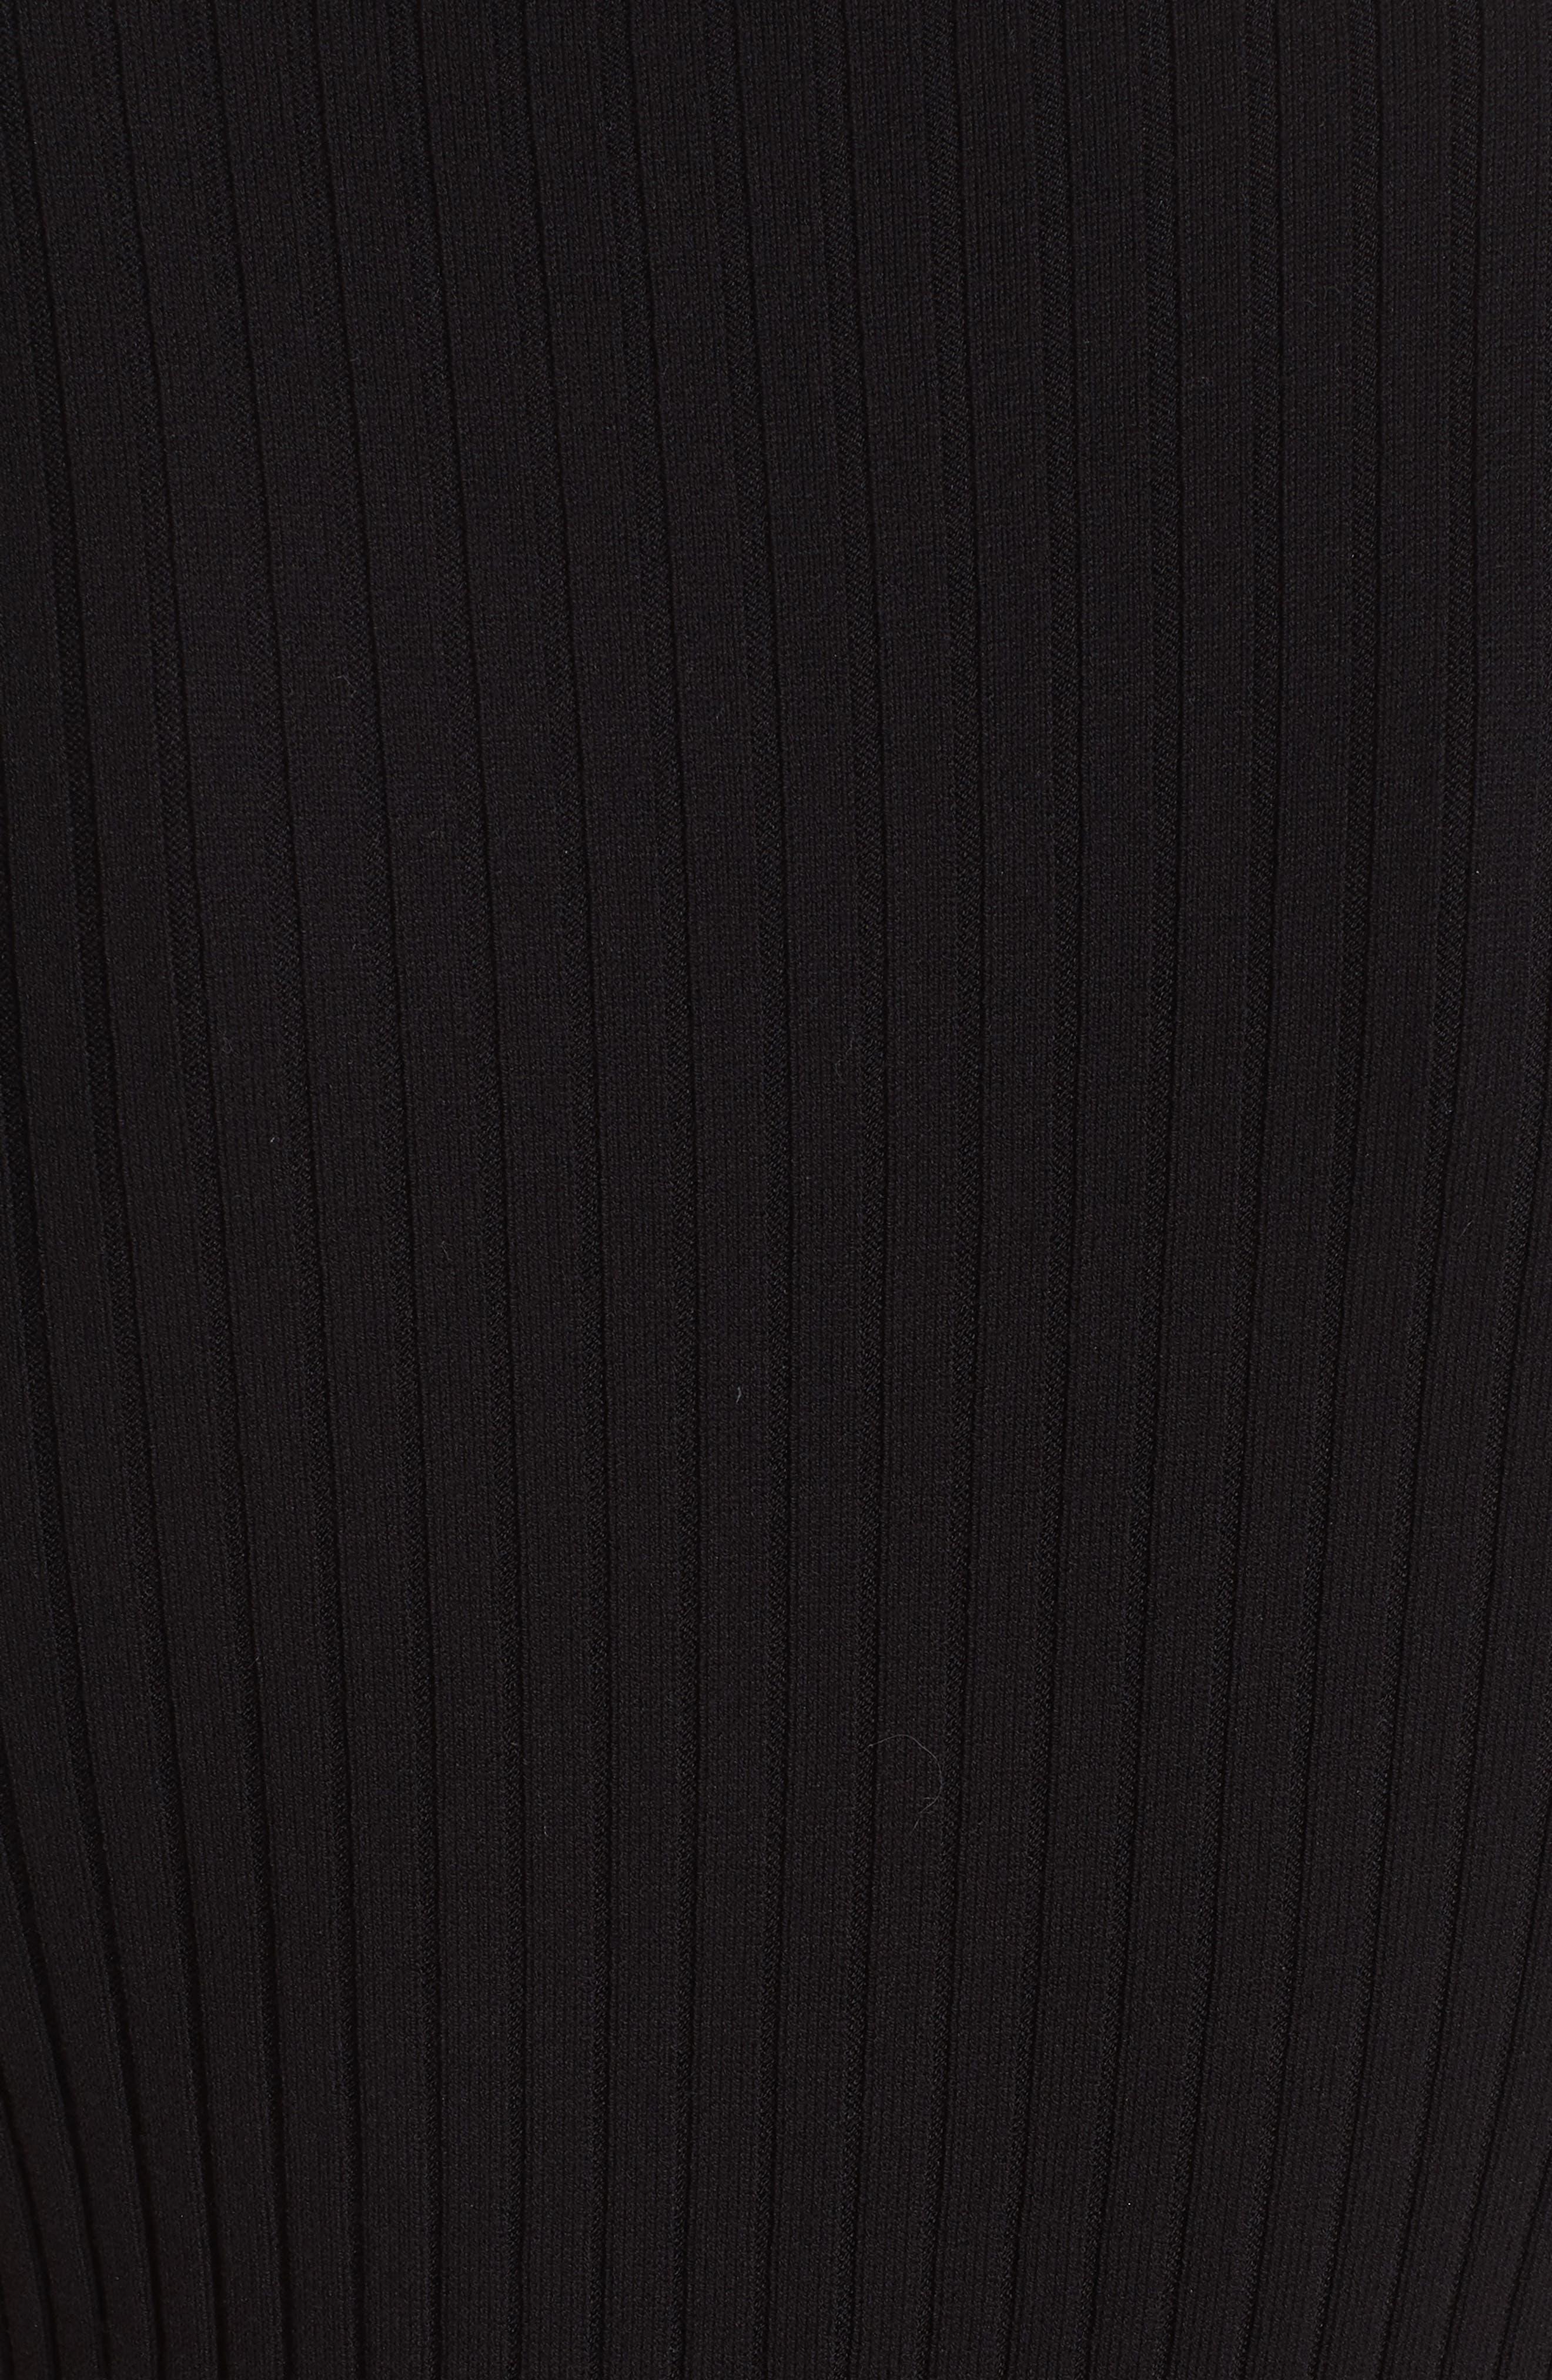 ST. JOHN COLLECTION, Flat Rib Knit Mock Neck Sweater, Alternate thumbnail 4, color, CAVIAR